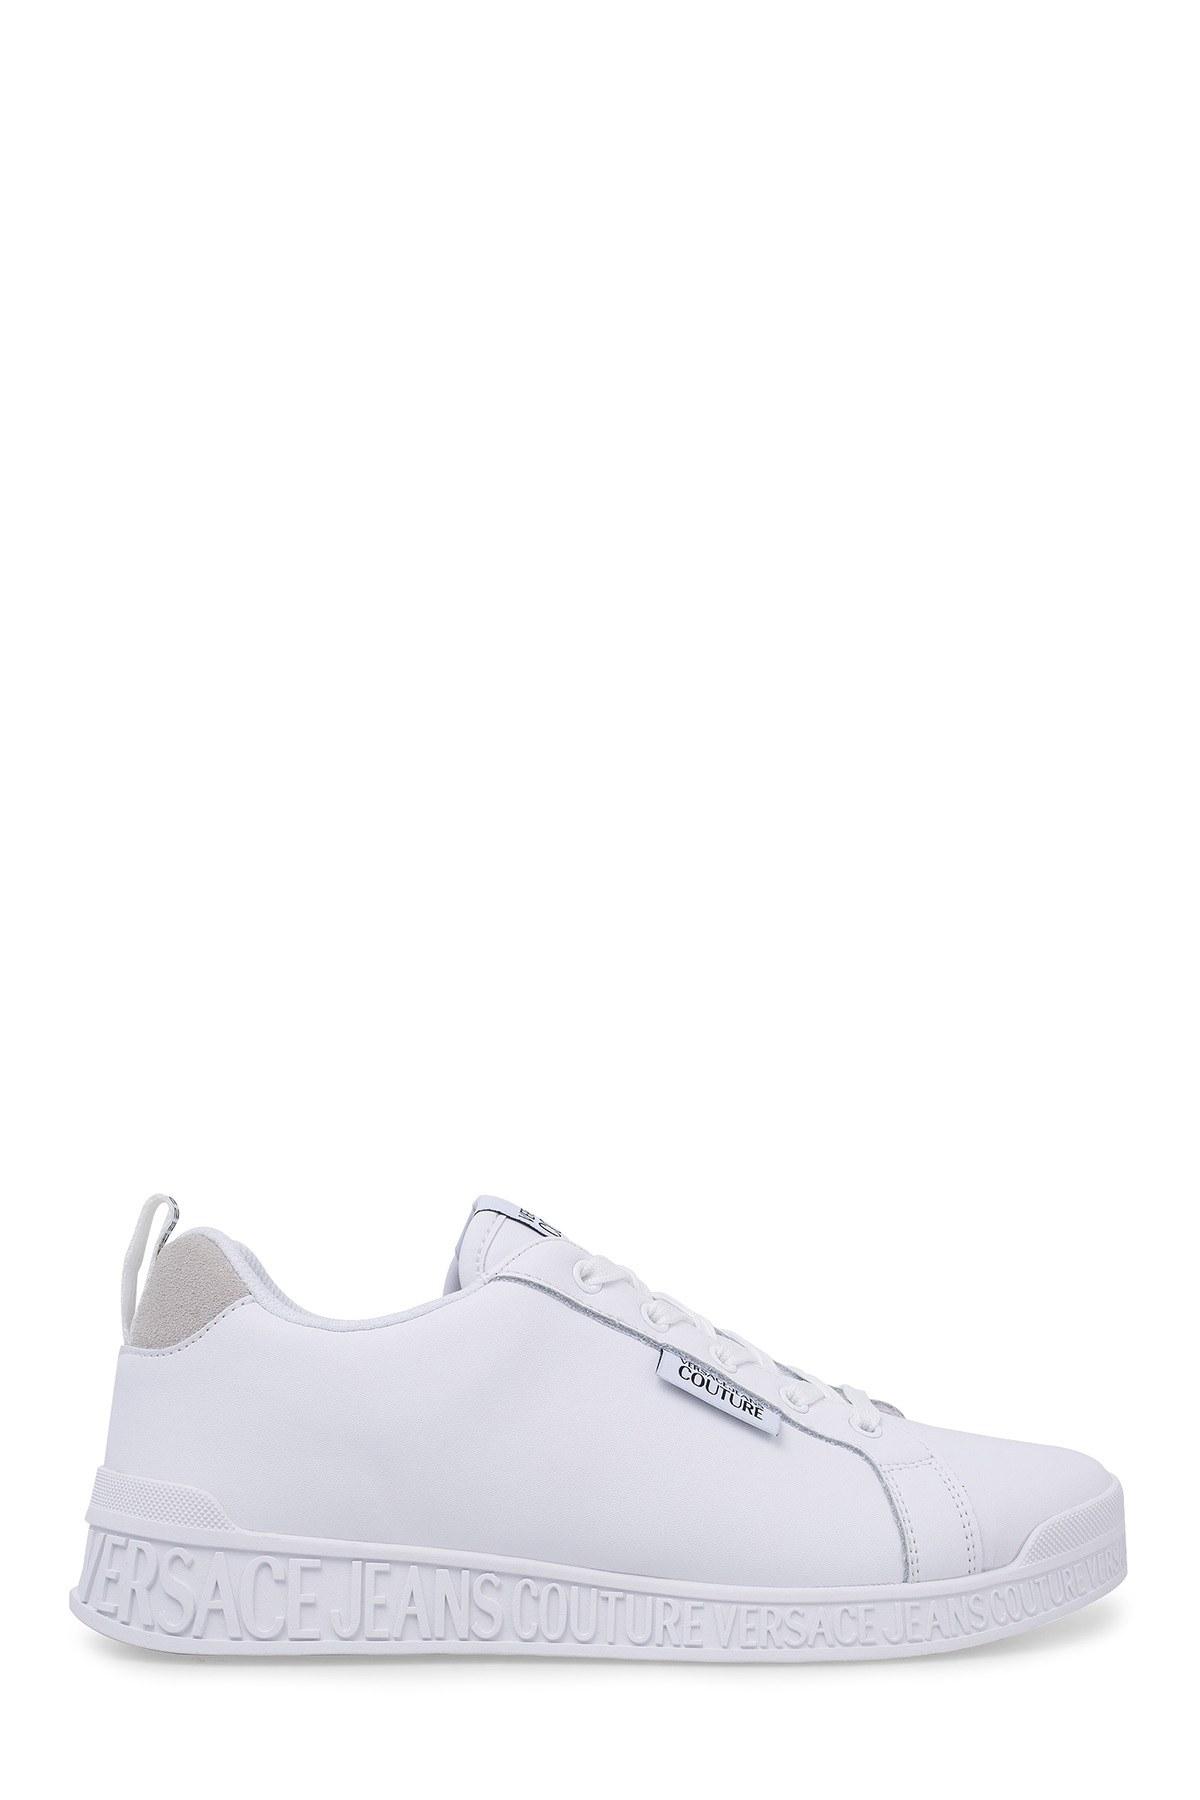 Versace Jeans Couture Kadın Ayakkabı E0VVBSP1 71523 003 BEYAZ